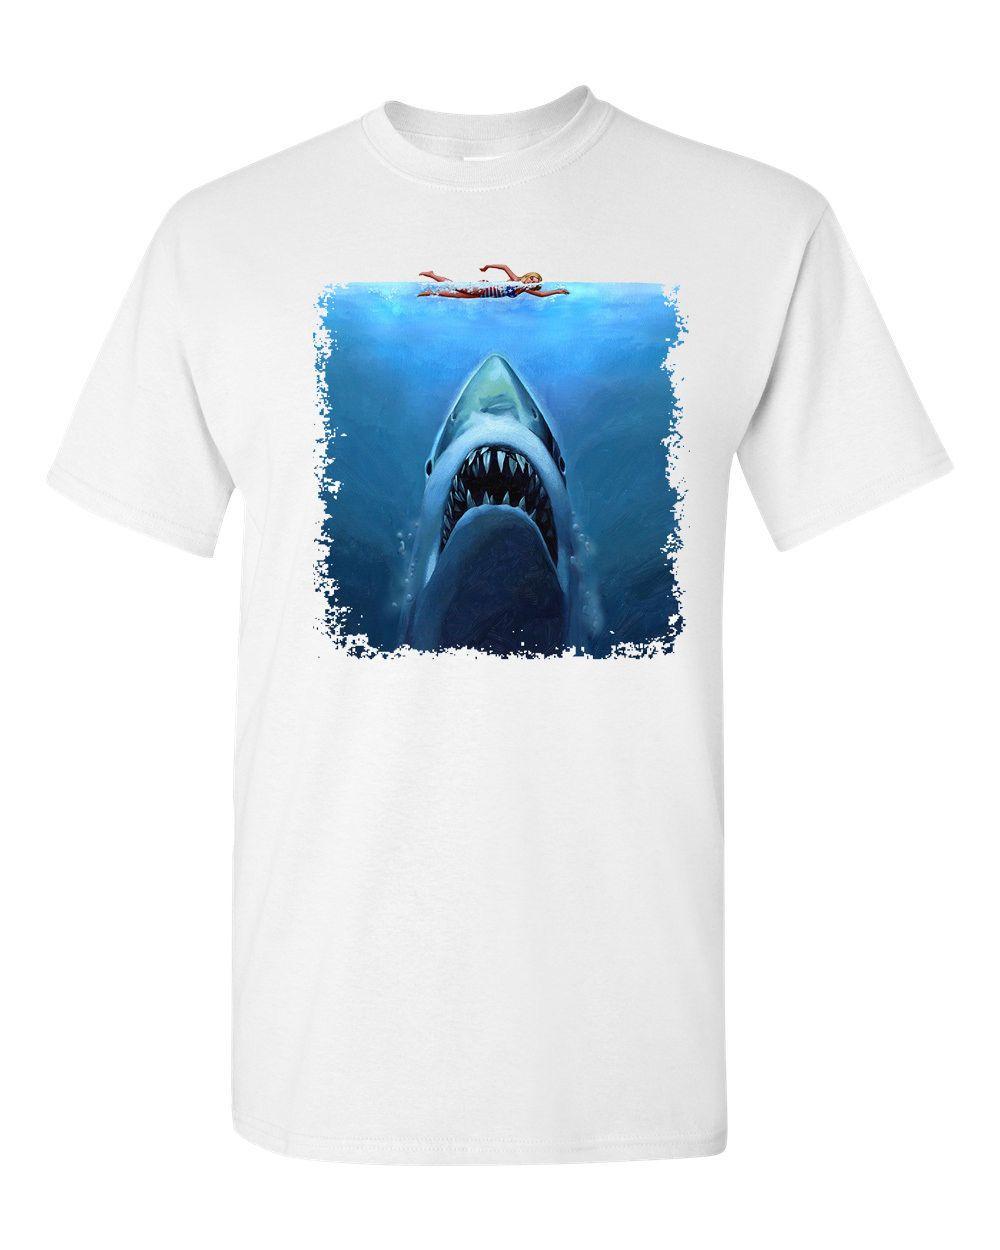 Shark Jaws Swimmer Attack Movie Shark Week Sublimation Men's Tee Shirt